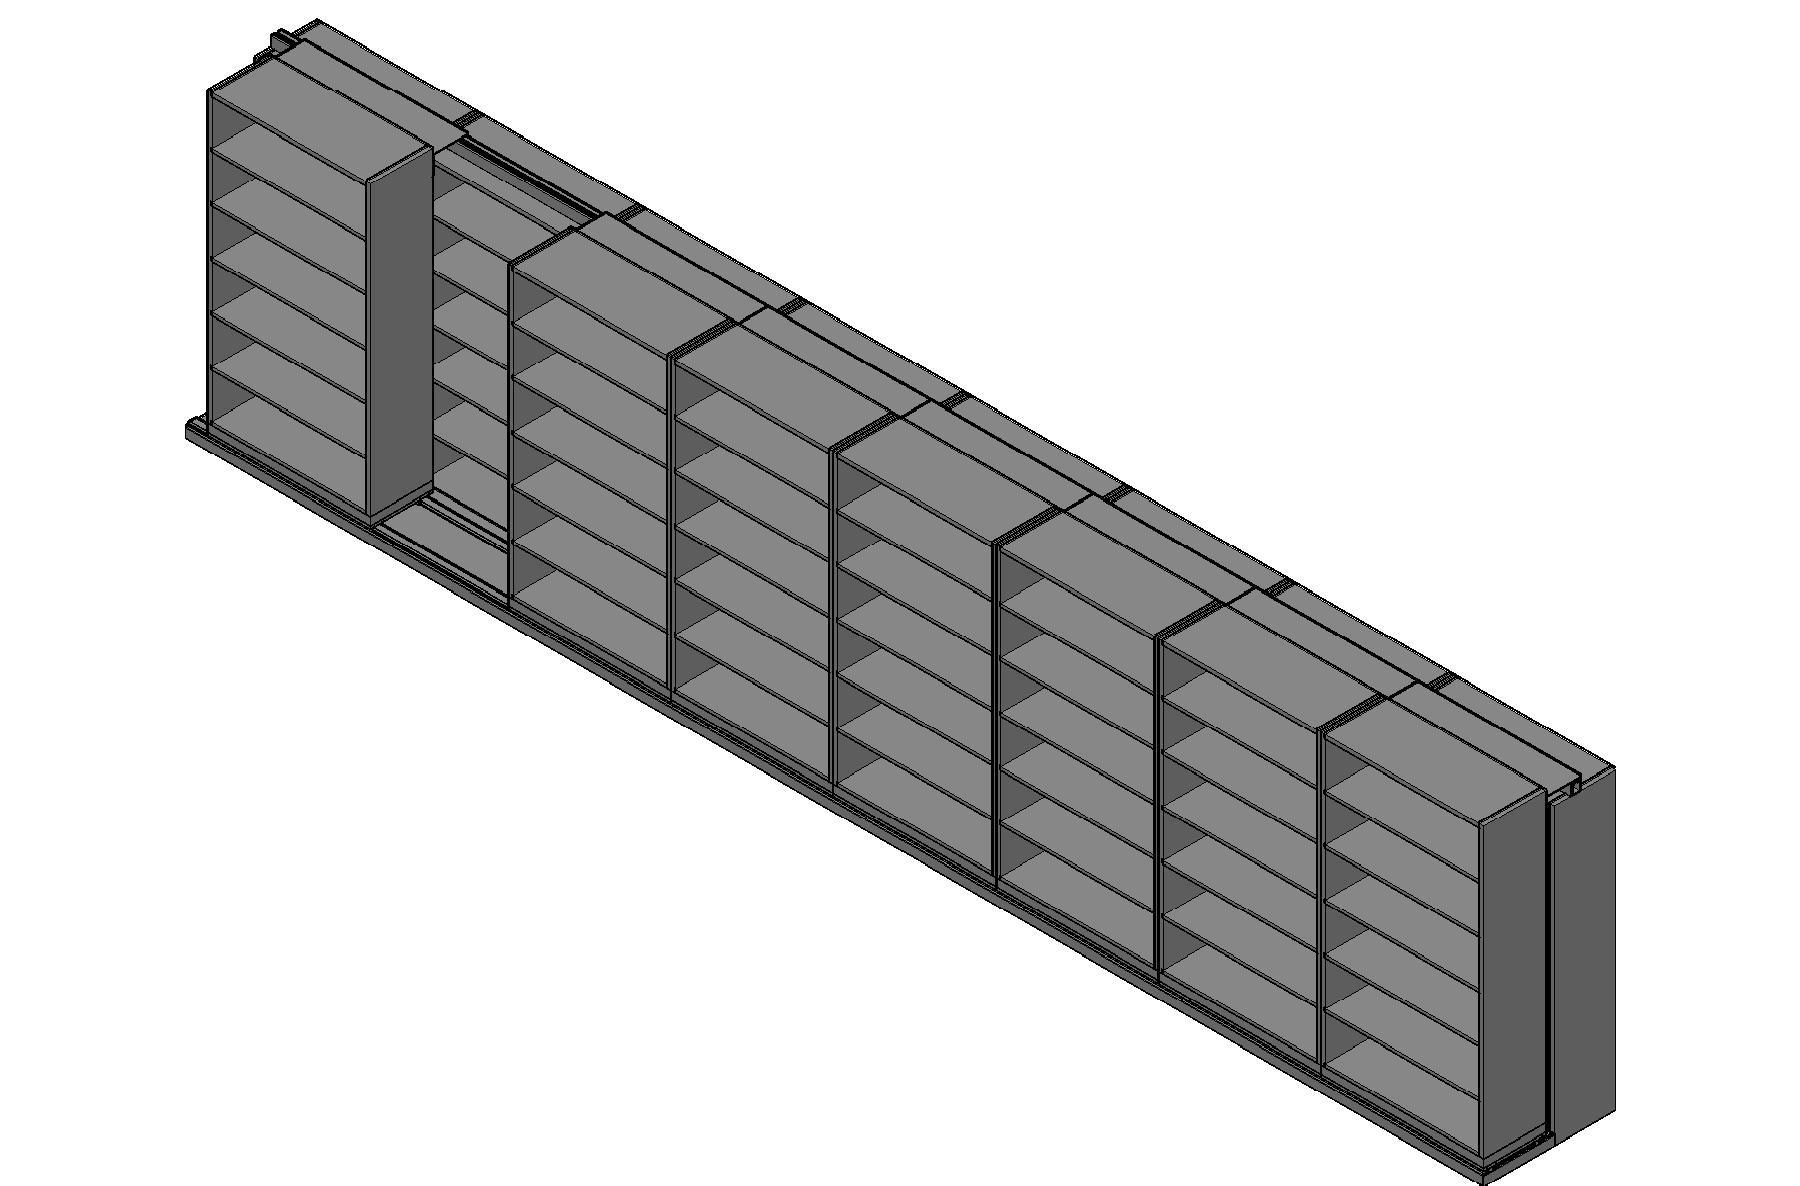 "Box Size Sliding Shelves - 2 Rows Deep - 6 Levels - (42"" x 16"" Shelves) - 340"" Total Width"